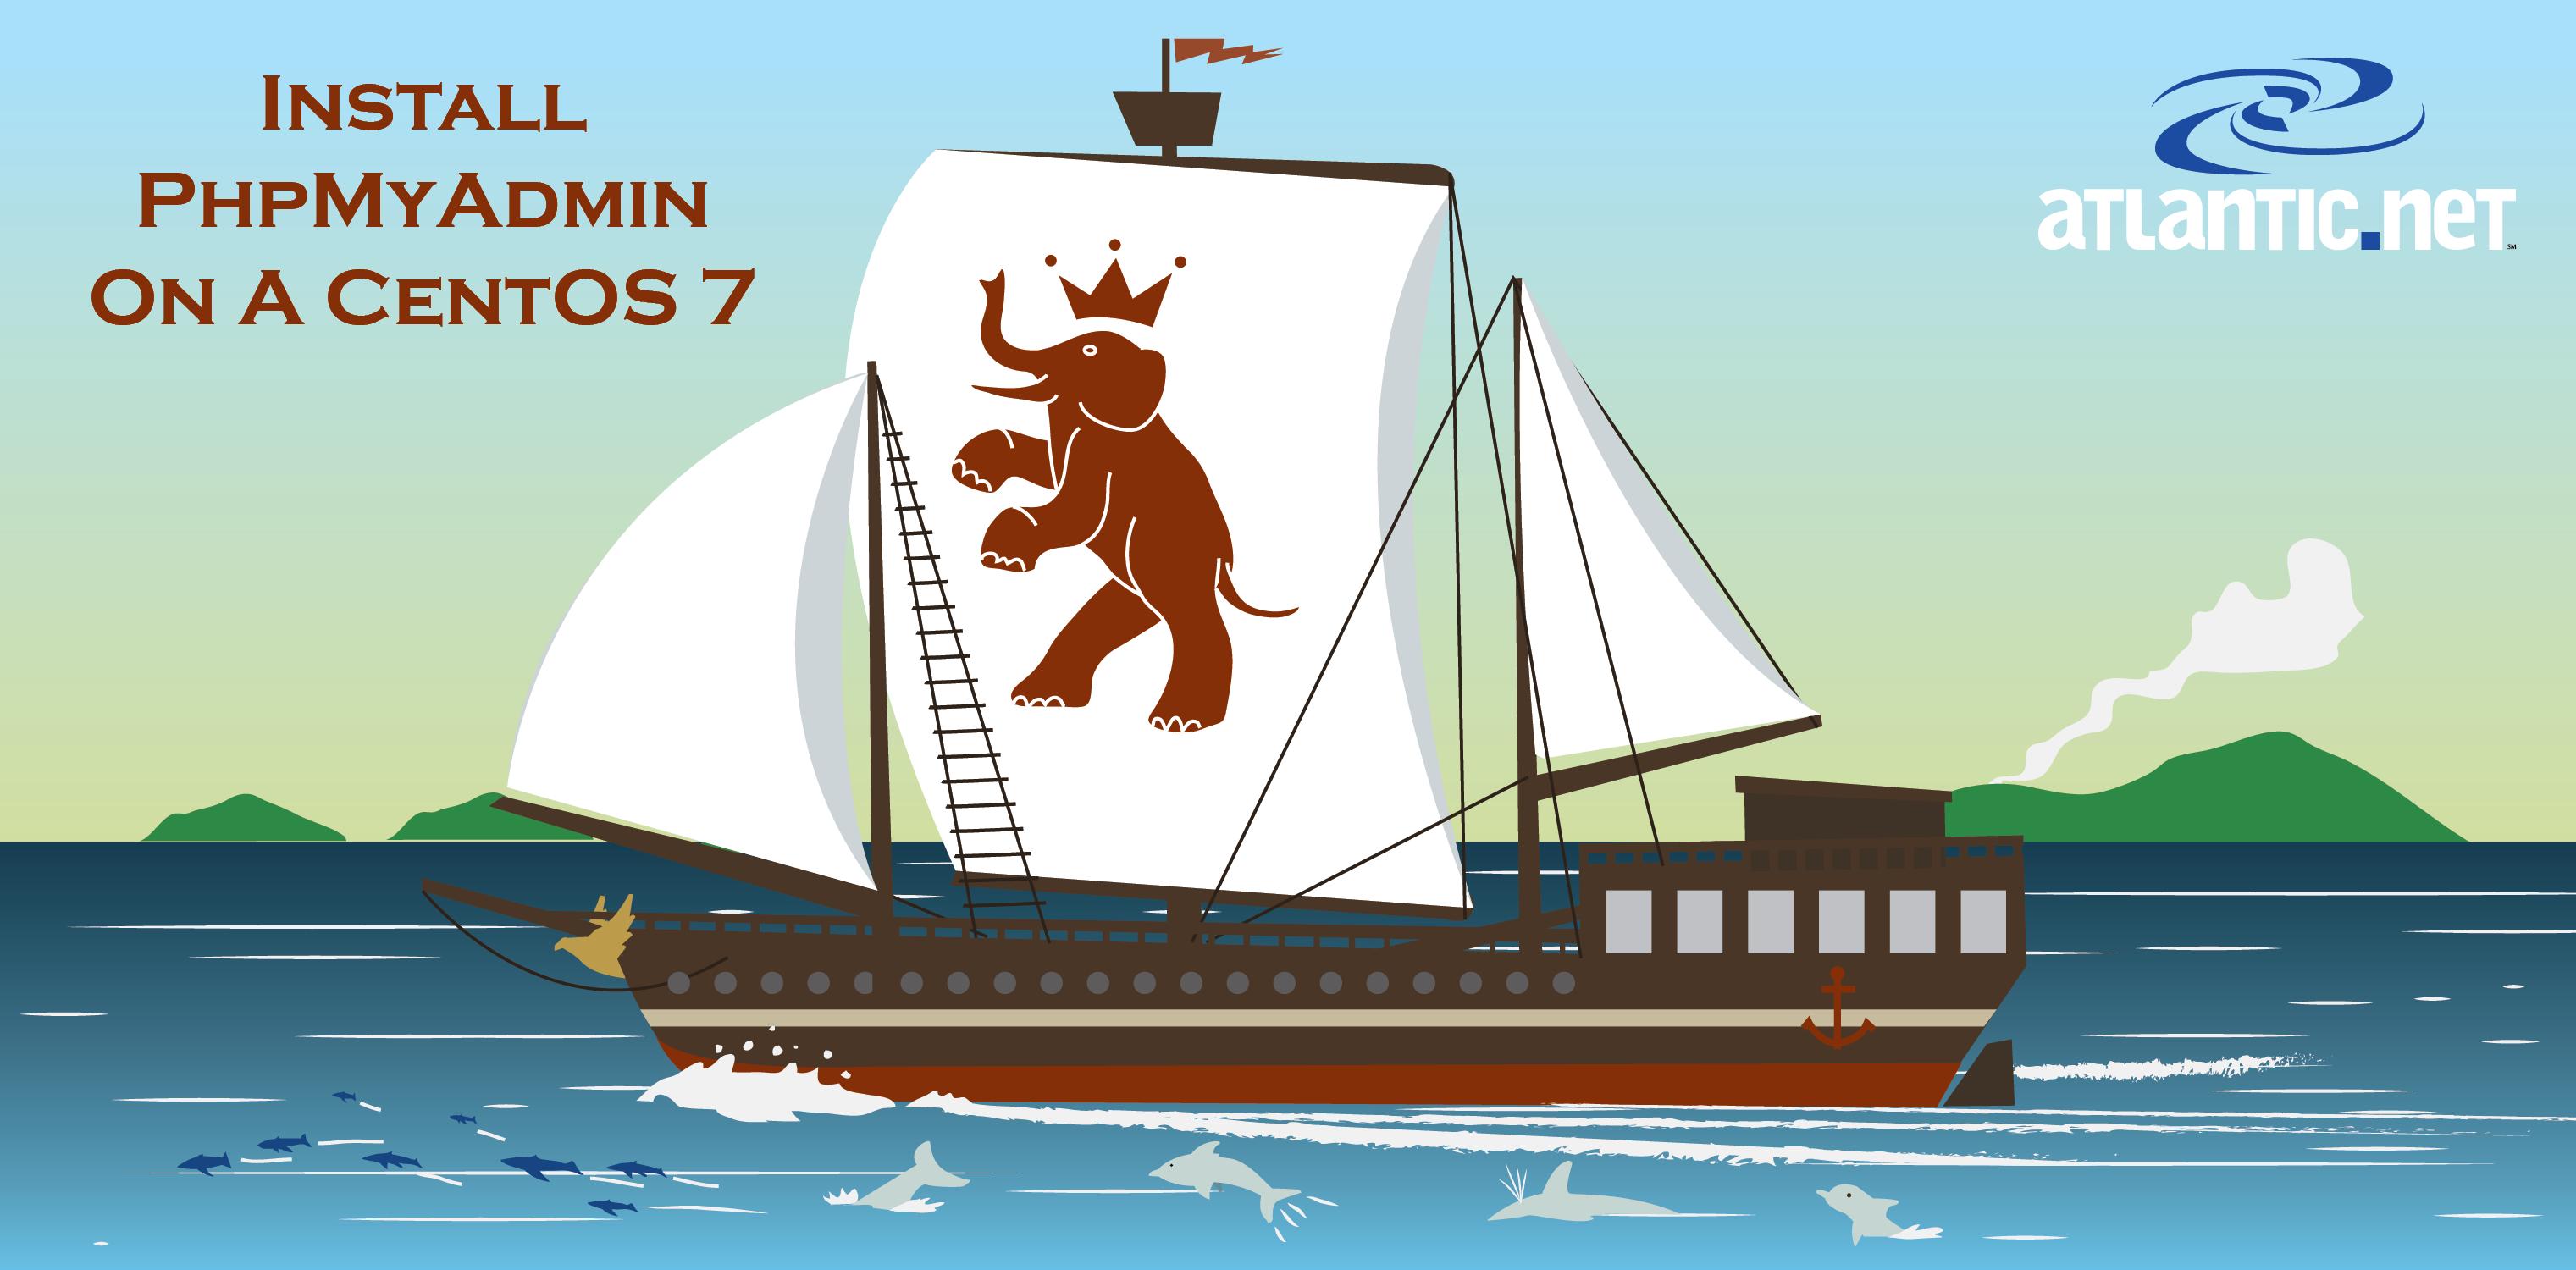 phpMyAdmin Ship Illustration by Walker Cahall